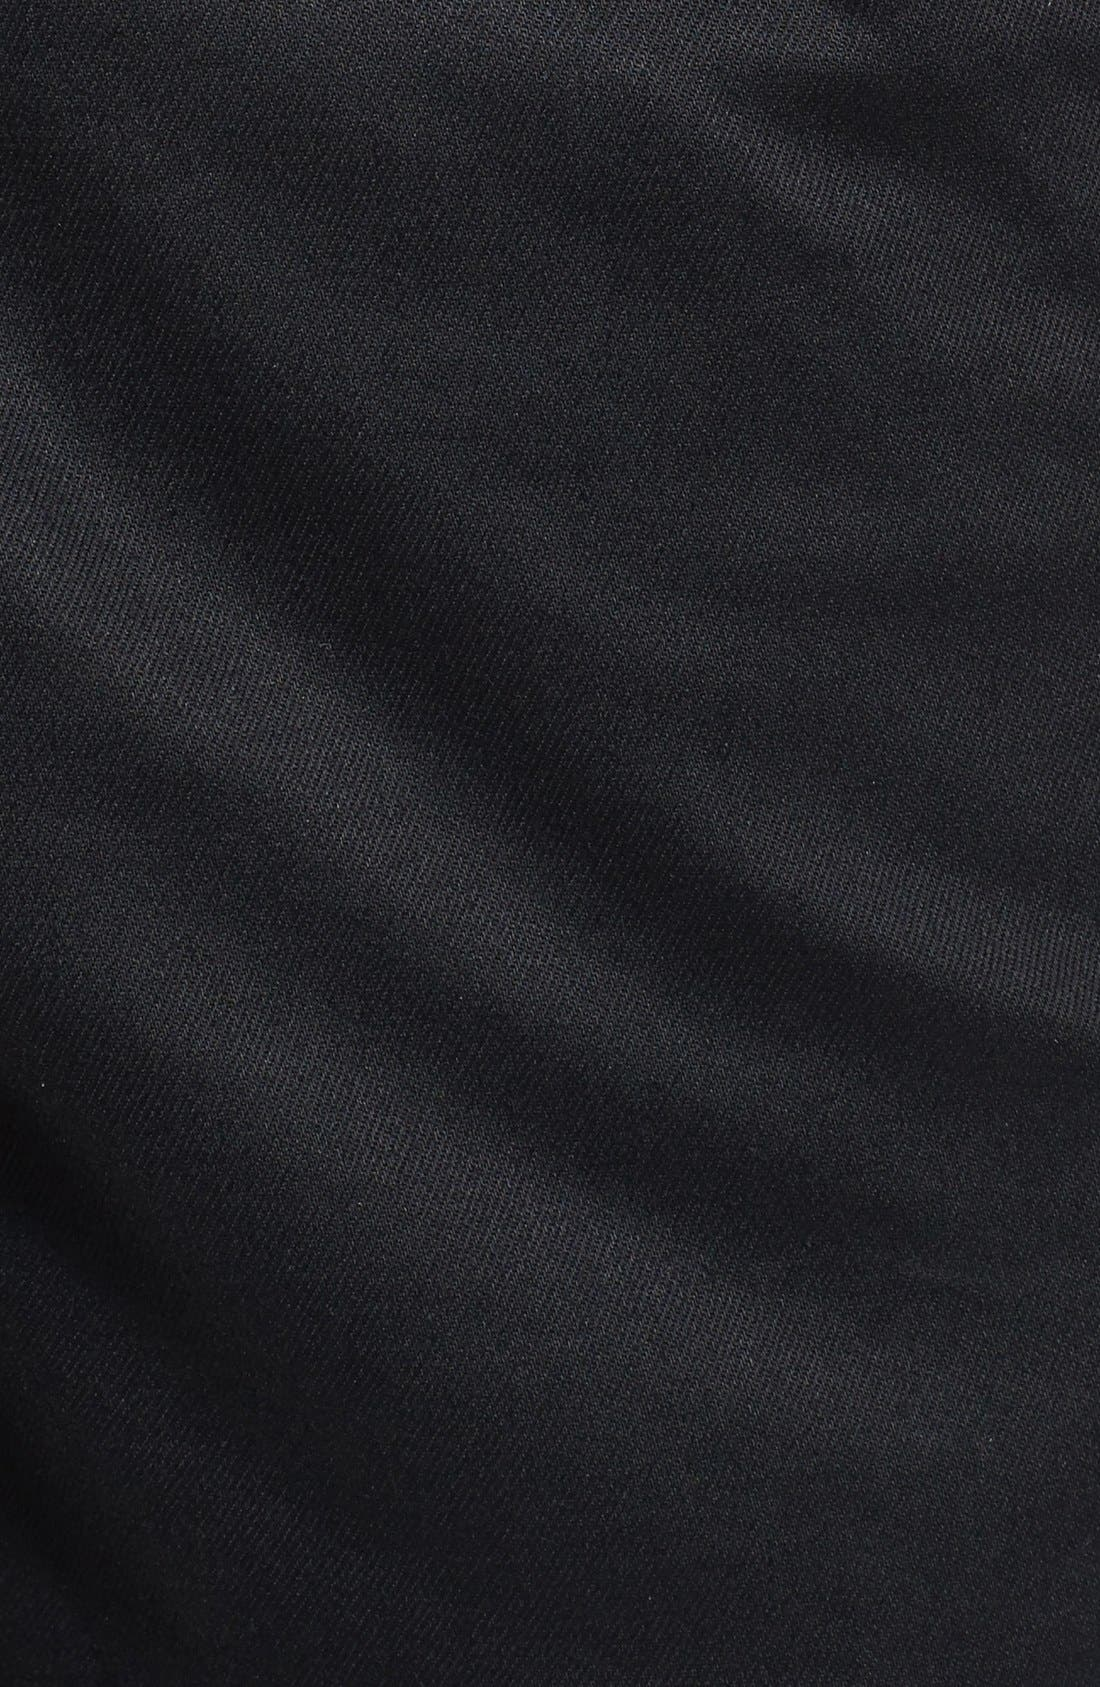 PUBLISH BRAND, 'Legacy' Tailored Fit Jogger Pants, Alternate thumbnail 4, color, 001